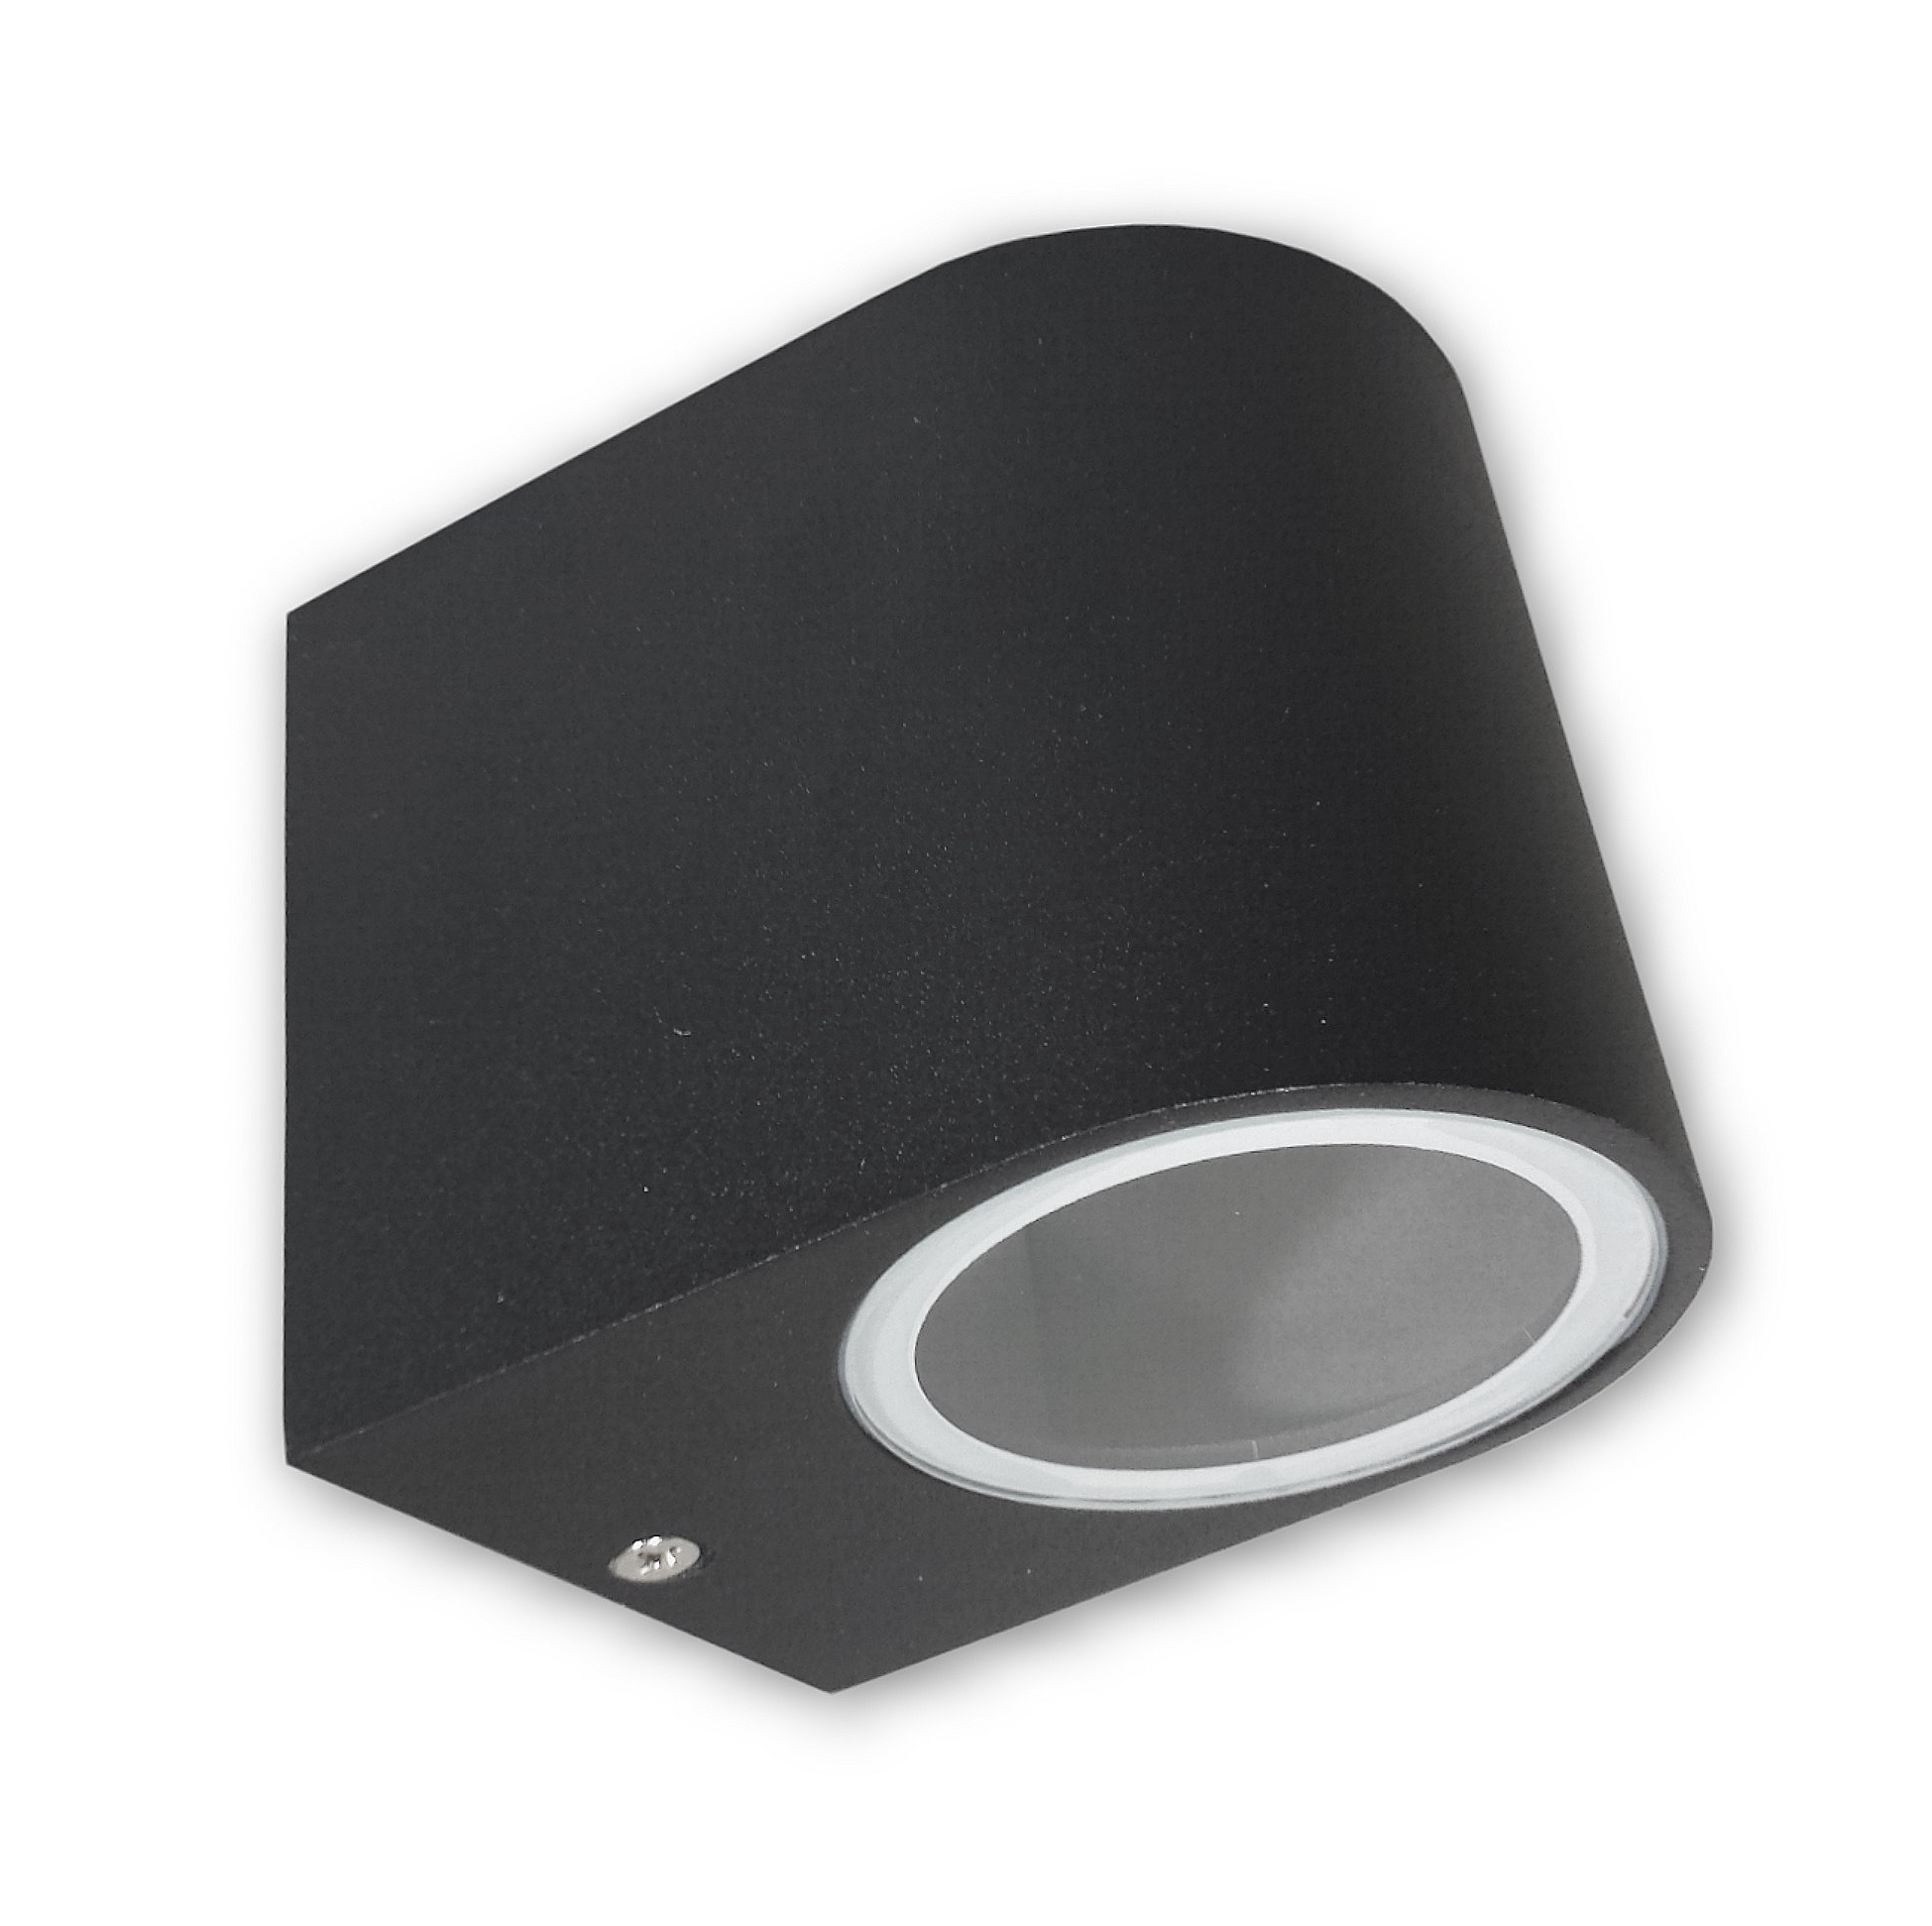 5w 7 5w gu10 dimmbar 230v led wandleuchte ip44 aufbaulampe spot aufbauleuchte. Black Bedroom Furniture Sets. Home Design Ideas